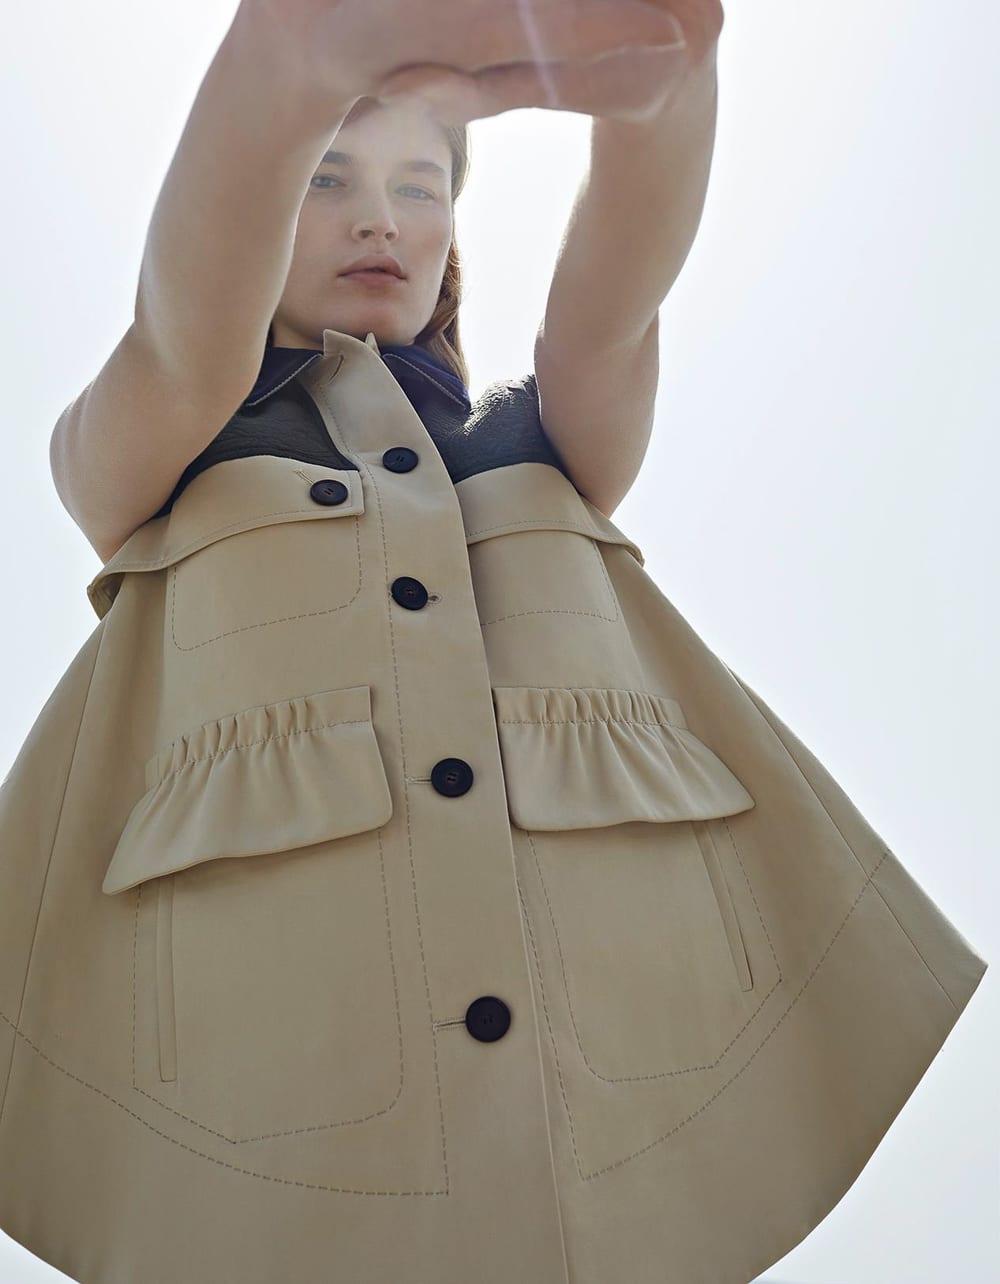 Vogue-Poland-Molly-Smith-Agata-Pospieszynska-8.jpg